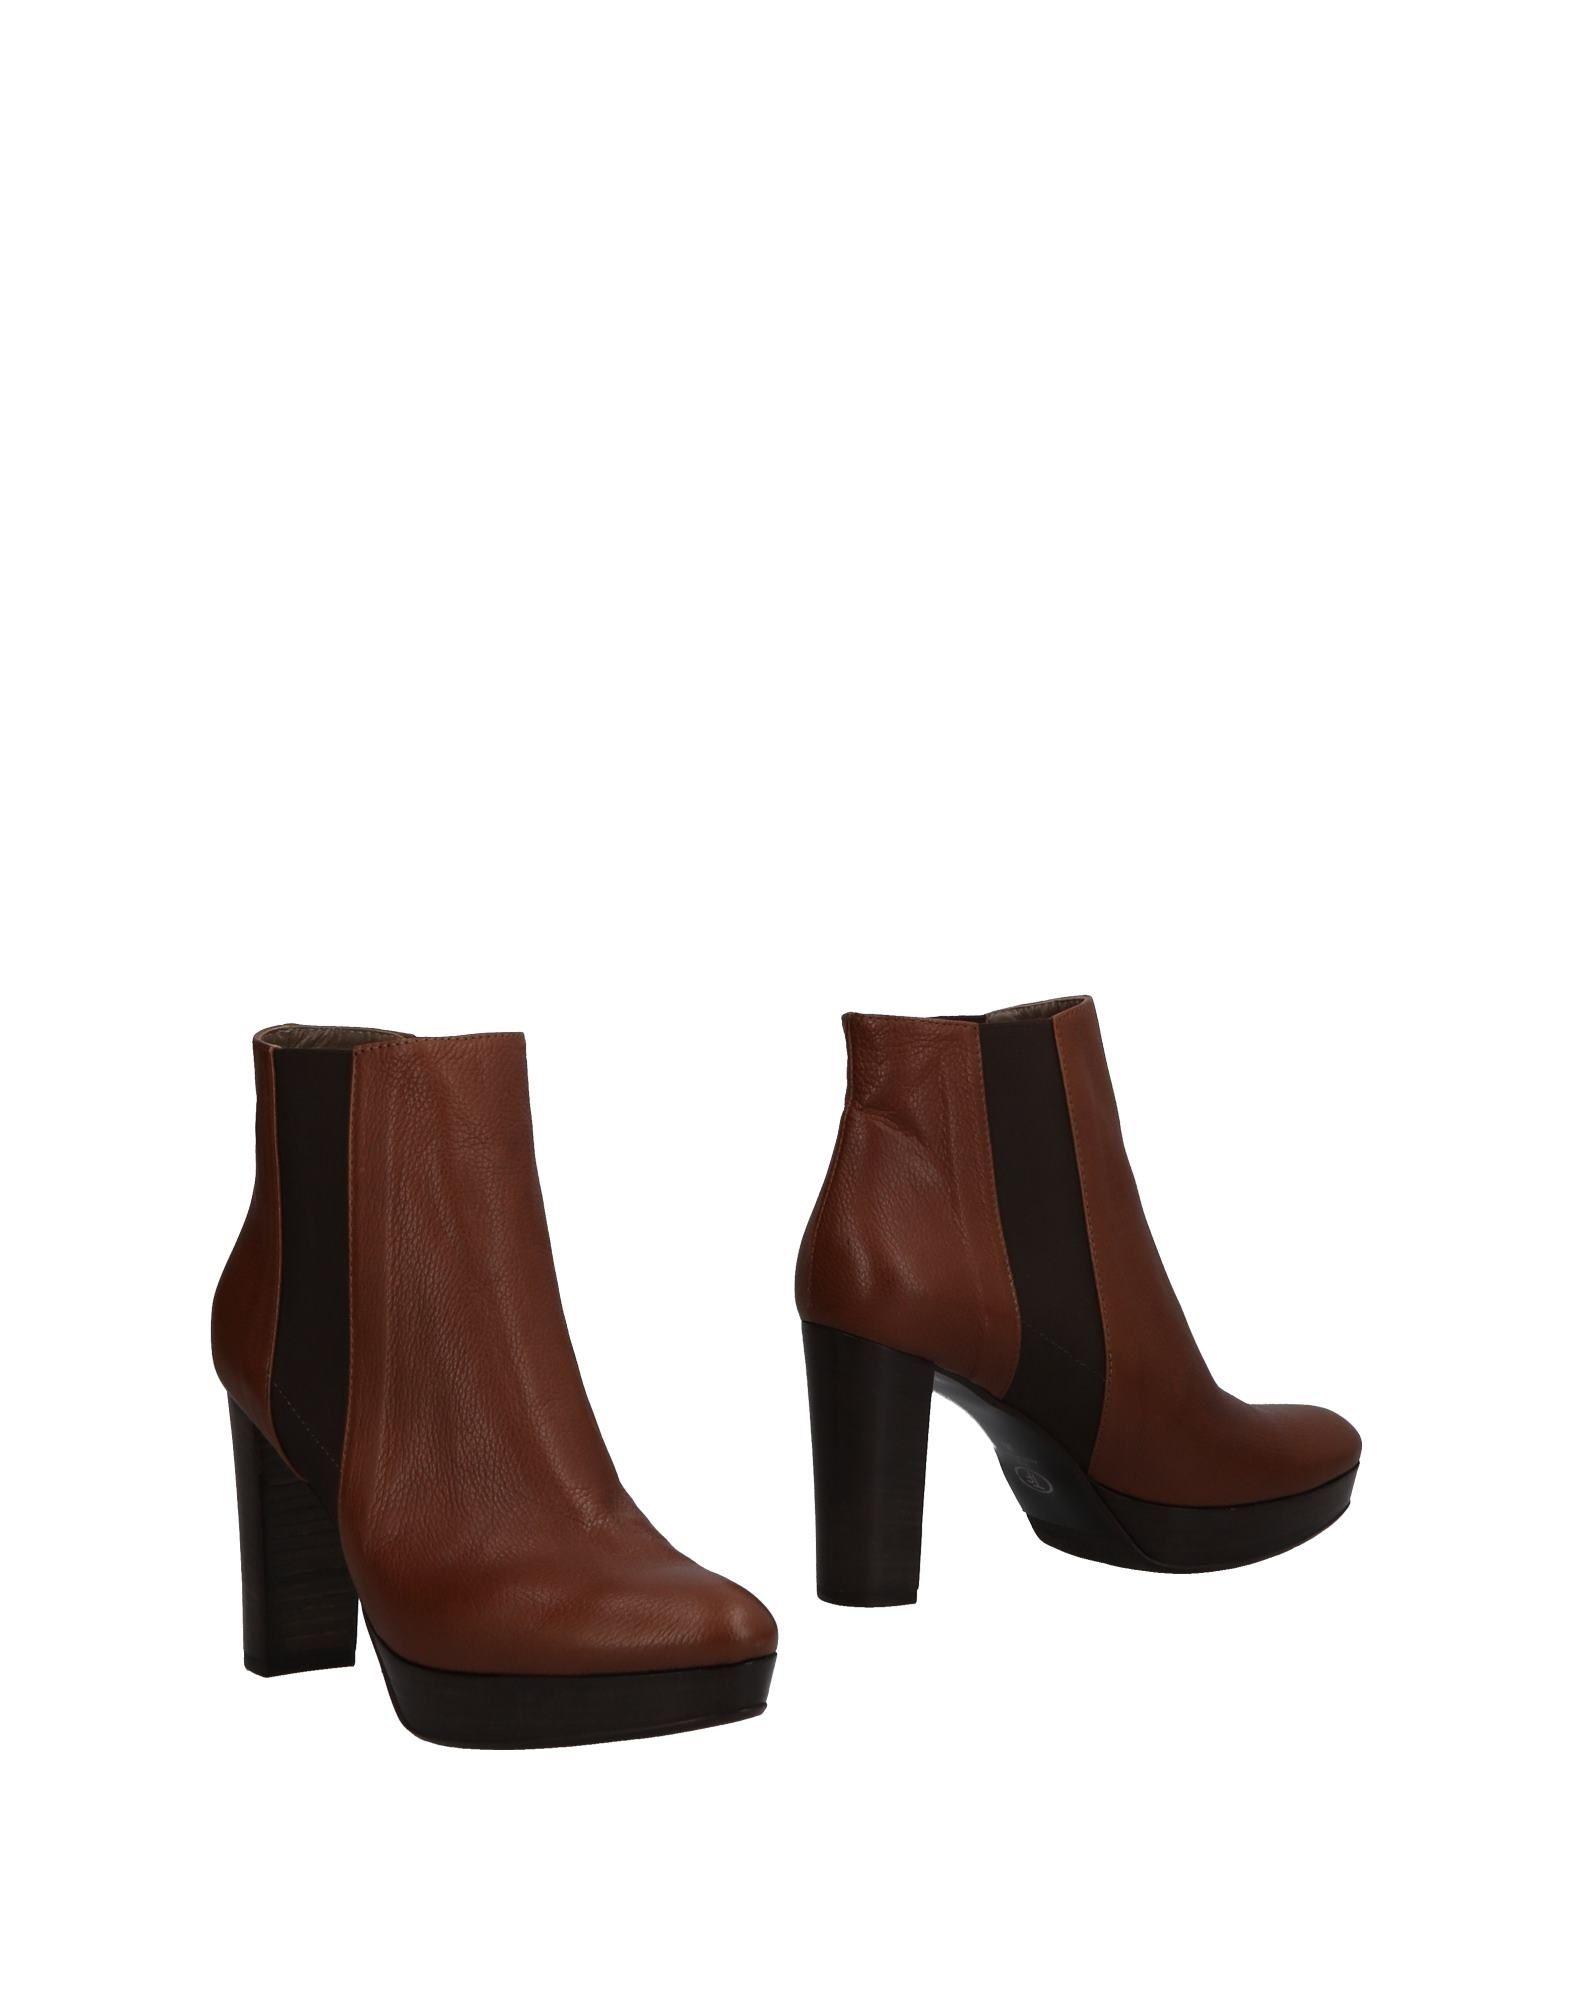 Gut Chelsea um billige Schuhe zu tragenTiziano Fratini Chelsea Gut Boots Damen  11502393AR 7f9e83